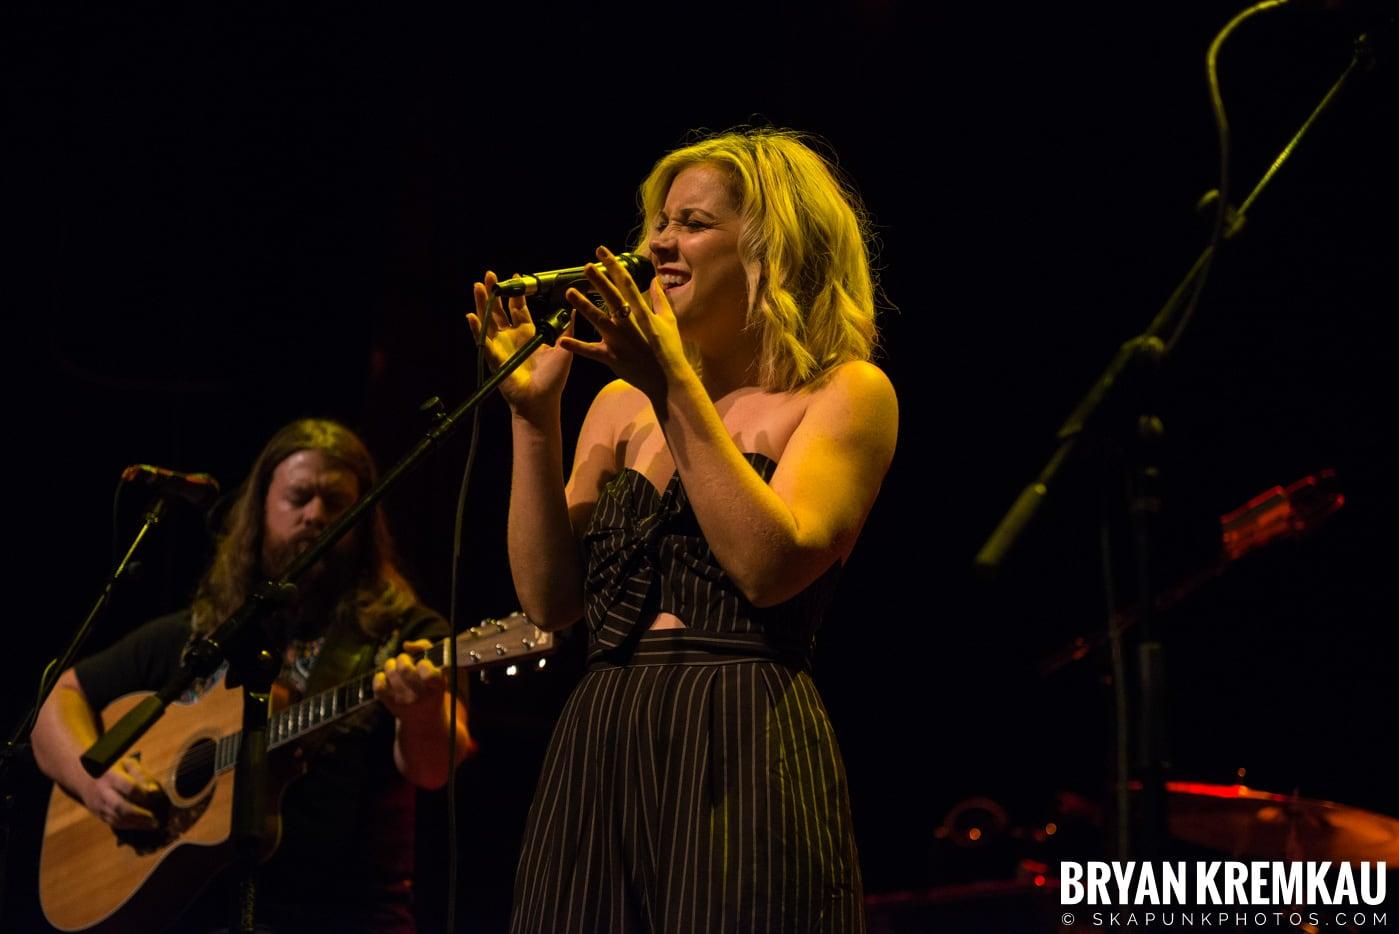 Emma Hern @ Gramercy Theatre, NYC - 11.2.18 (2)